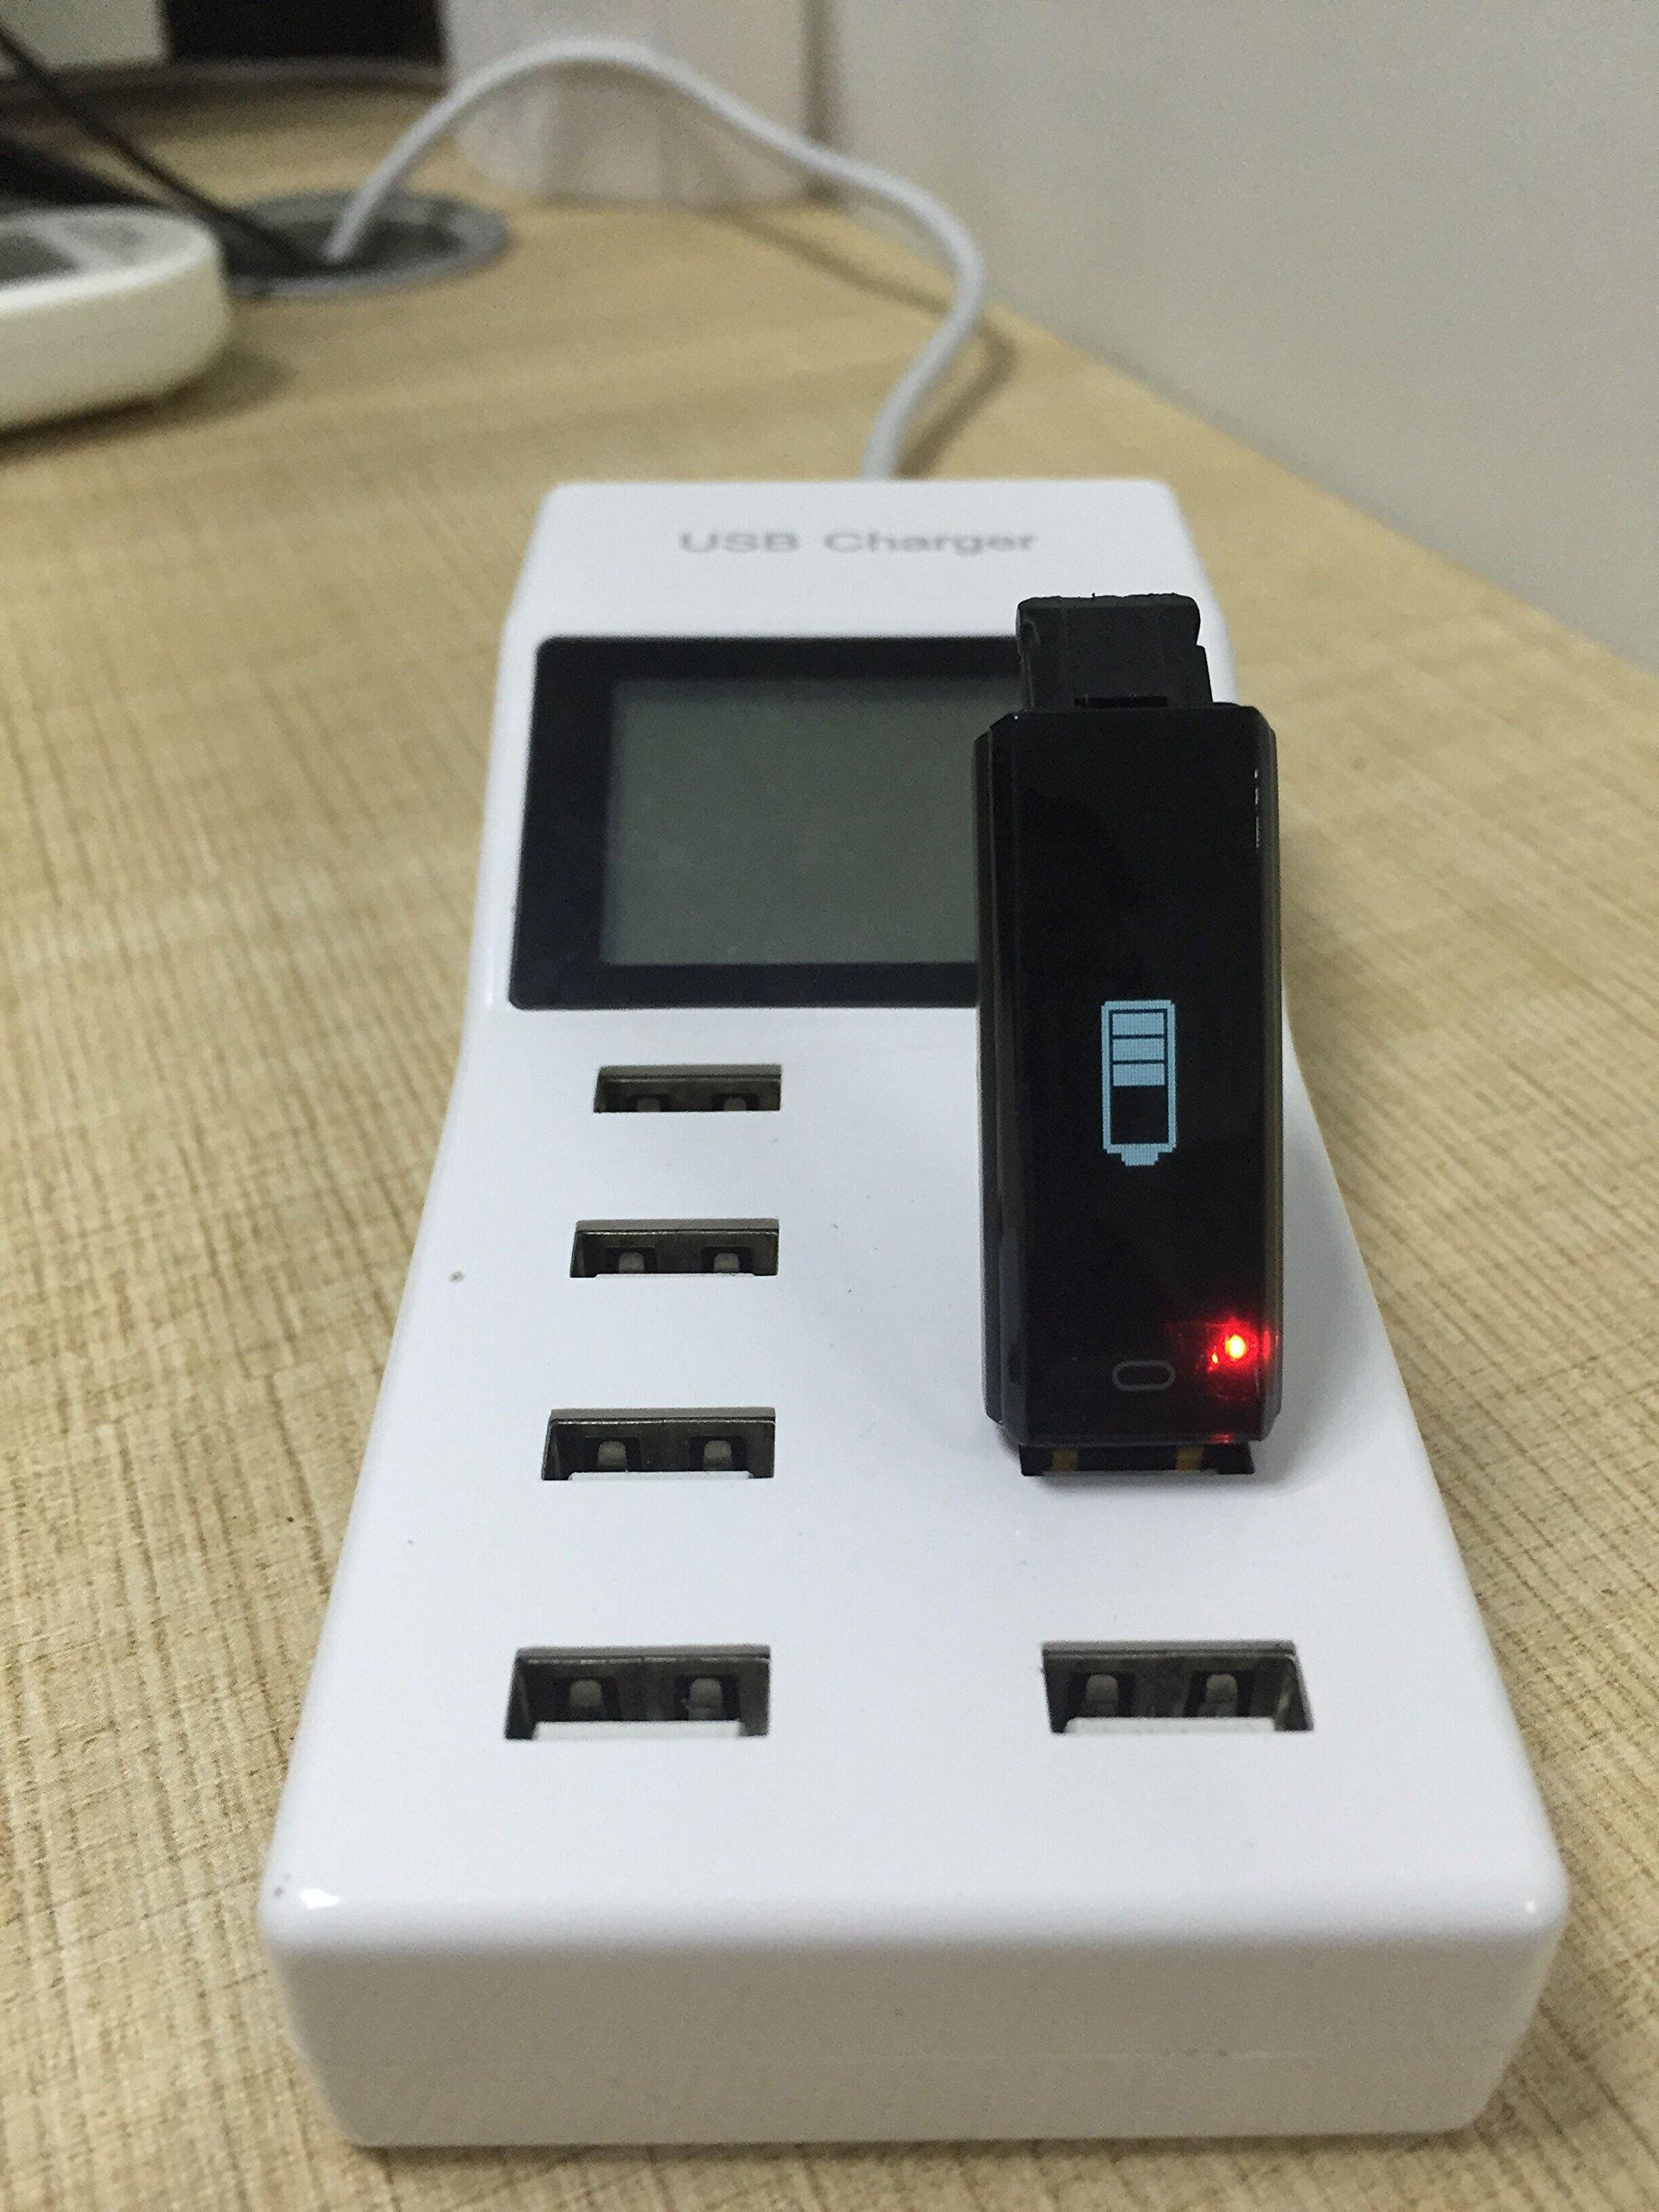 Arbily Pulsera Inteligente, Fitness Tracker Smart Wristband Bracelet monitorear la Actividad de Seguimiento de BOT¨®n t¨¢ctil de Bluetooth Pulsera Brazalete Deportivo Impermeable IP66 de la Aptitud 7